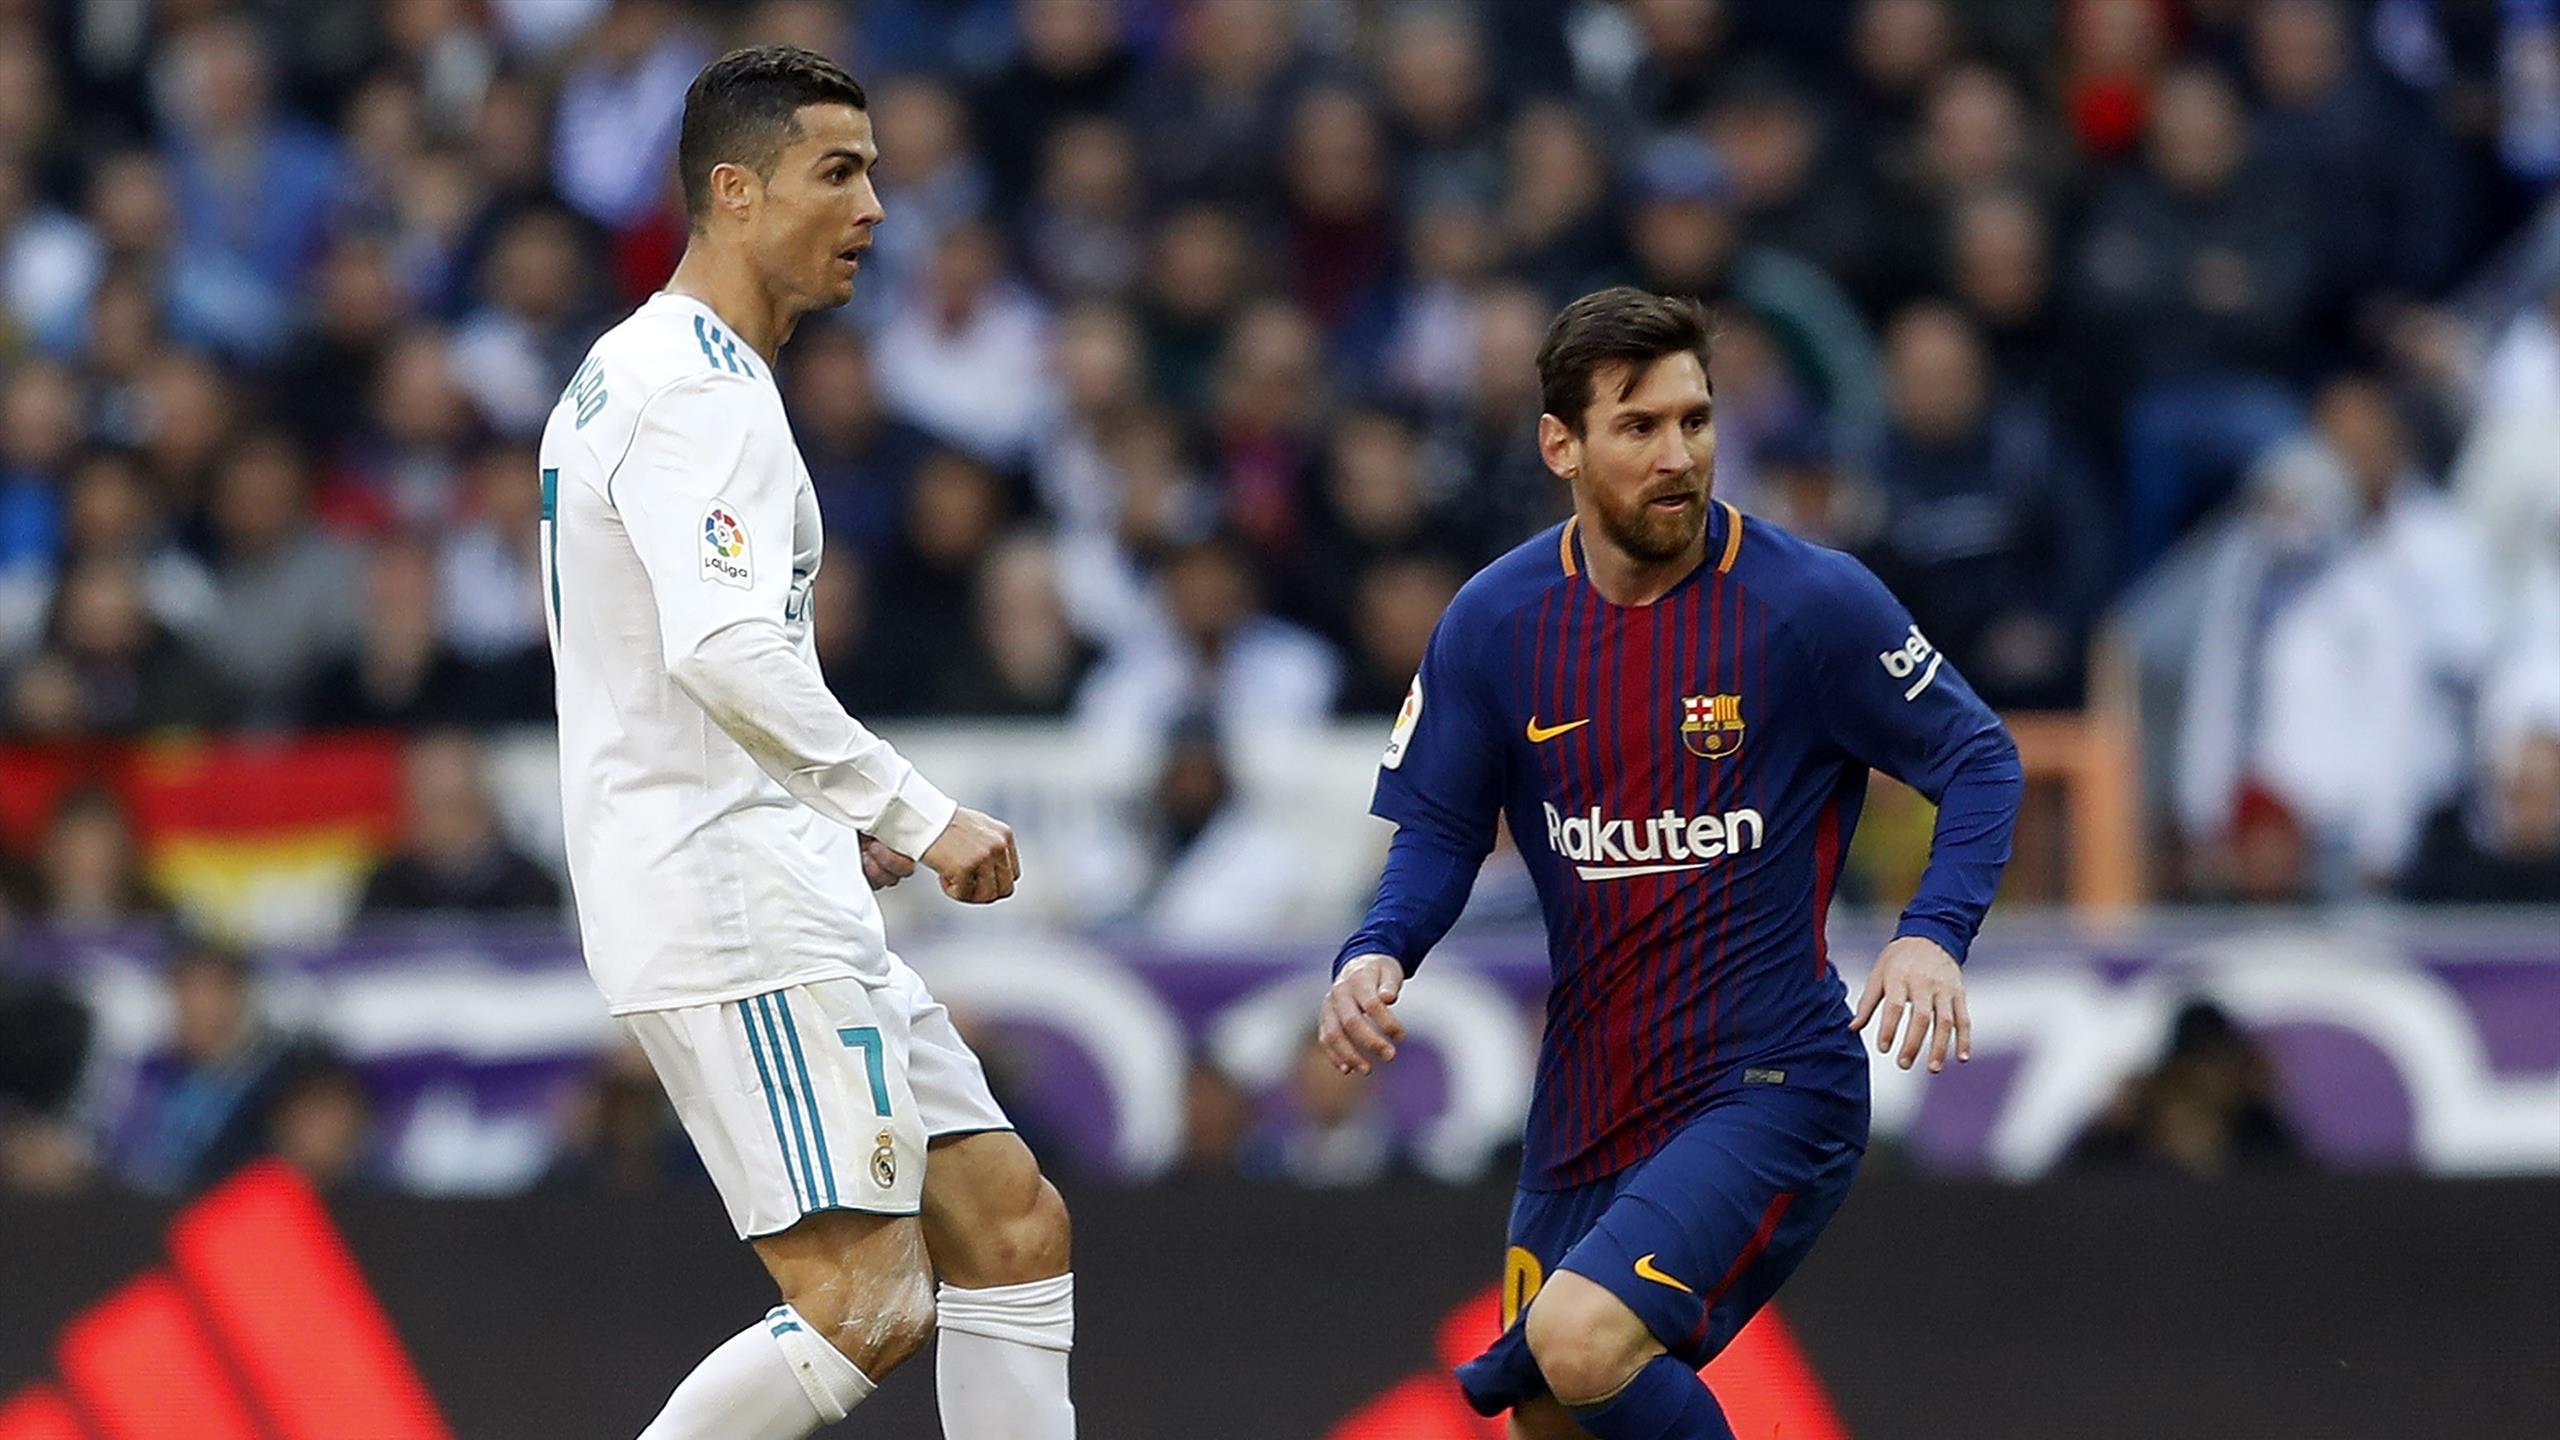 Видео матчей сб испаний по футболу